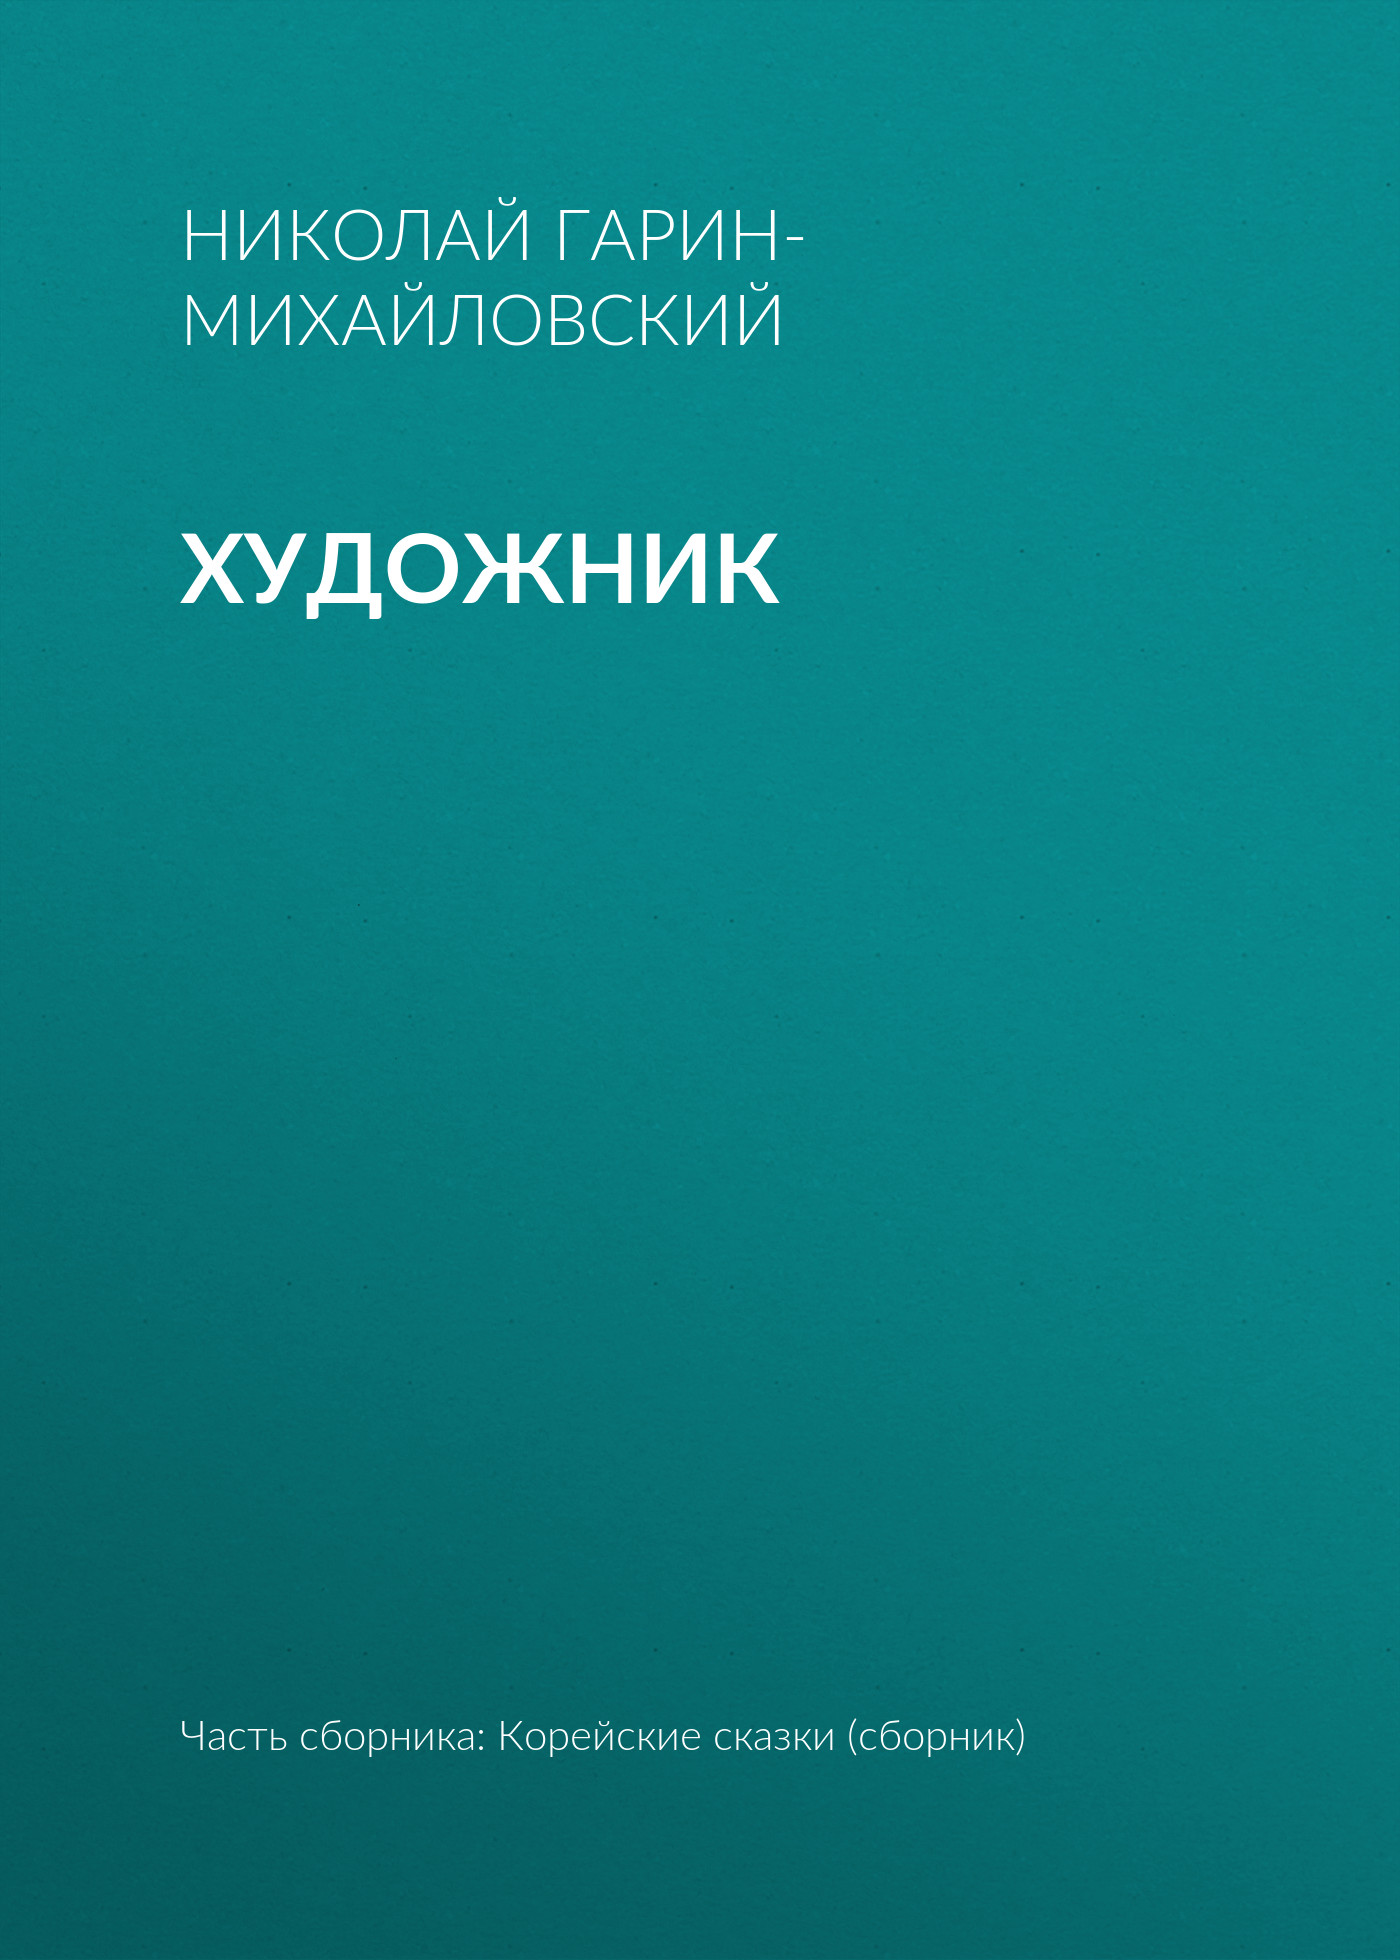 Николай Гарин-Михайловский Художник цена